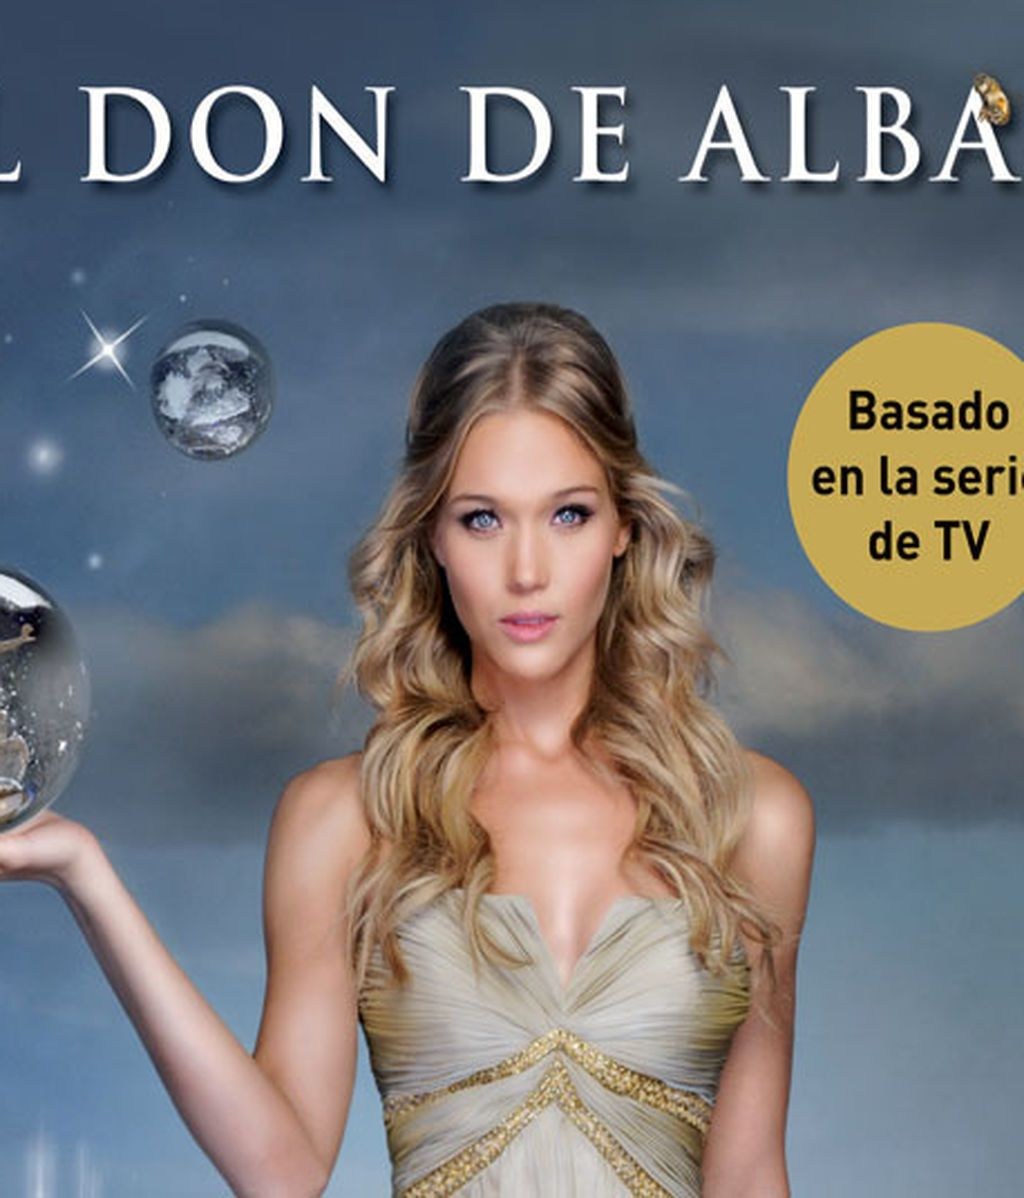 Don de Alba novela